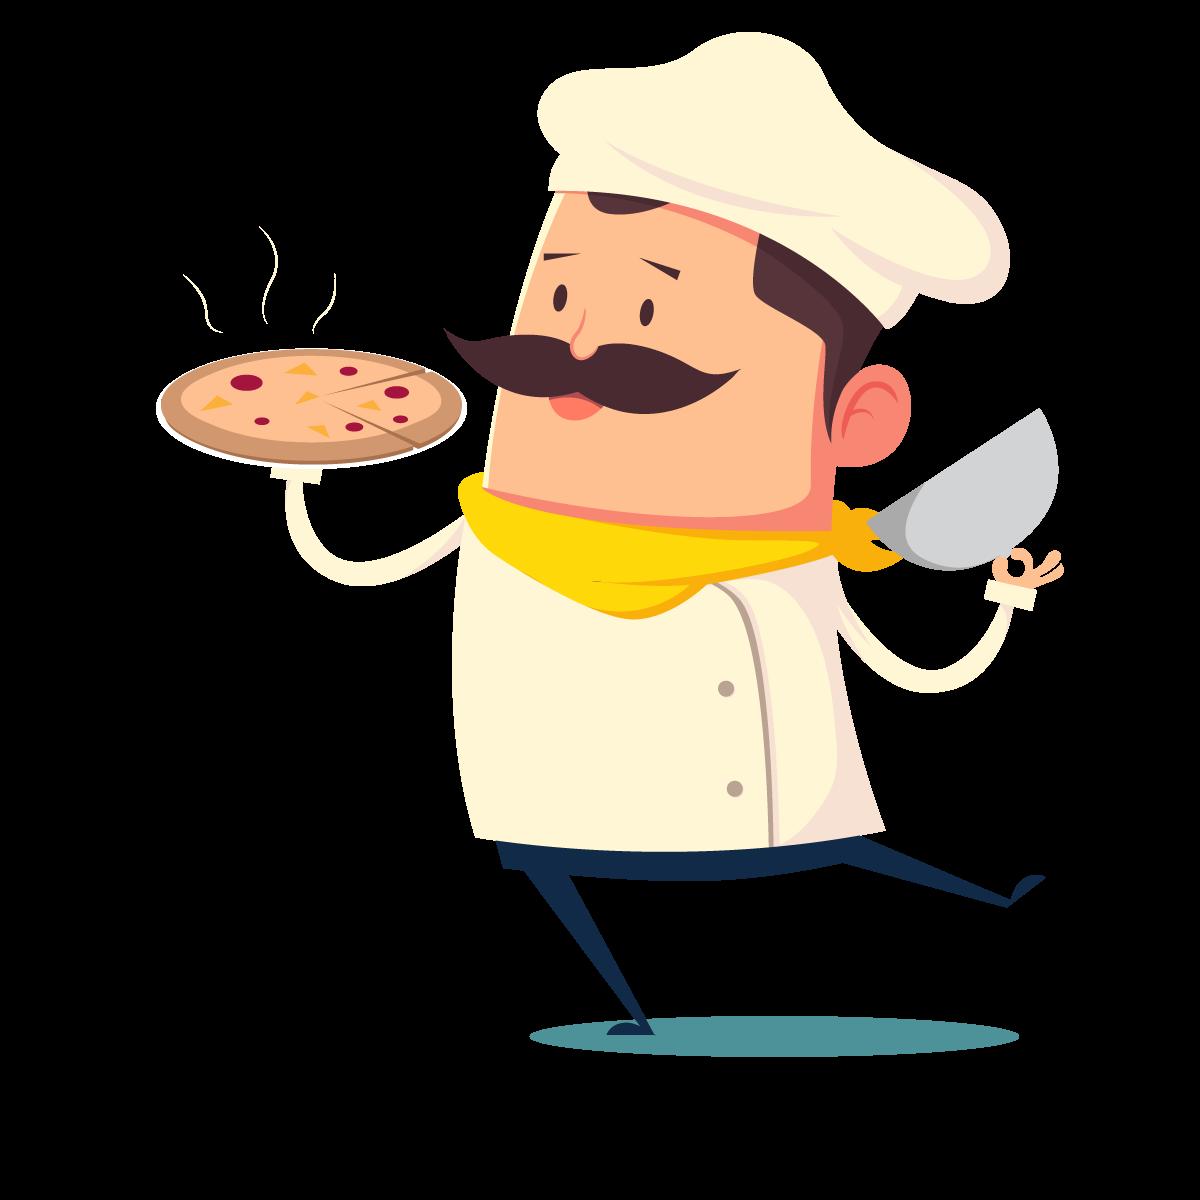 chef cuisinier vecto istock png